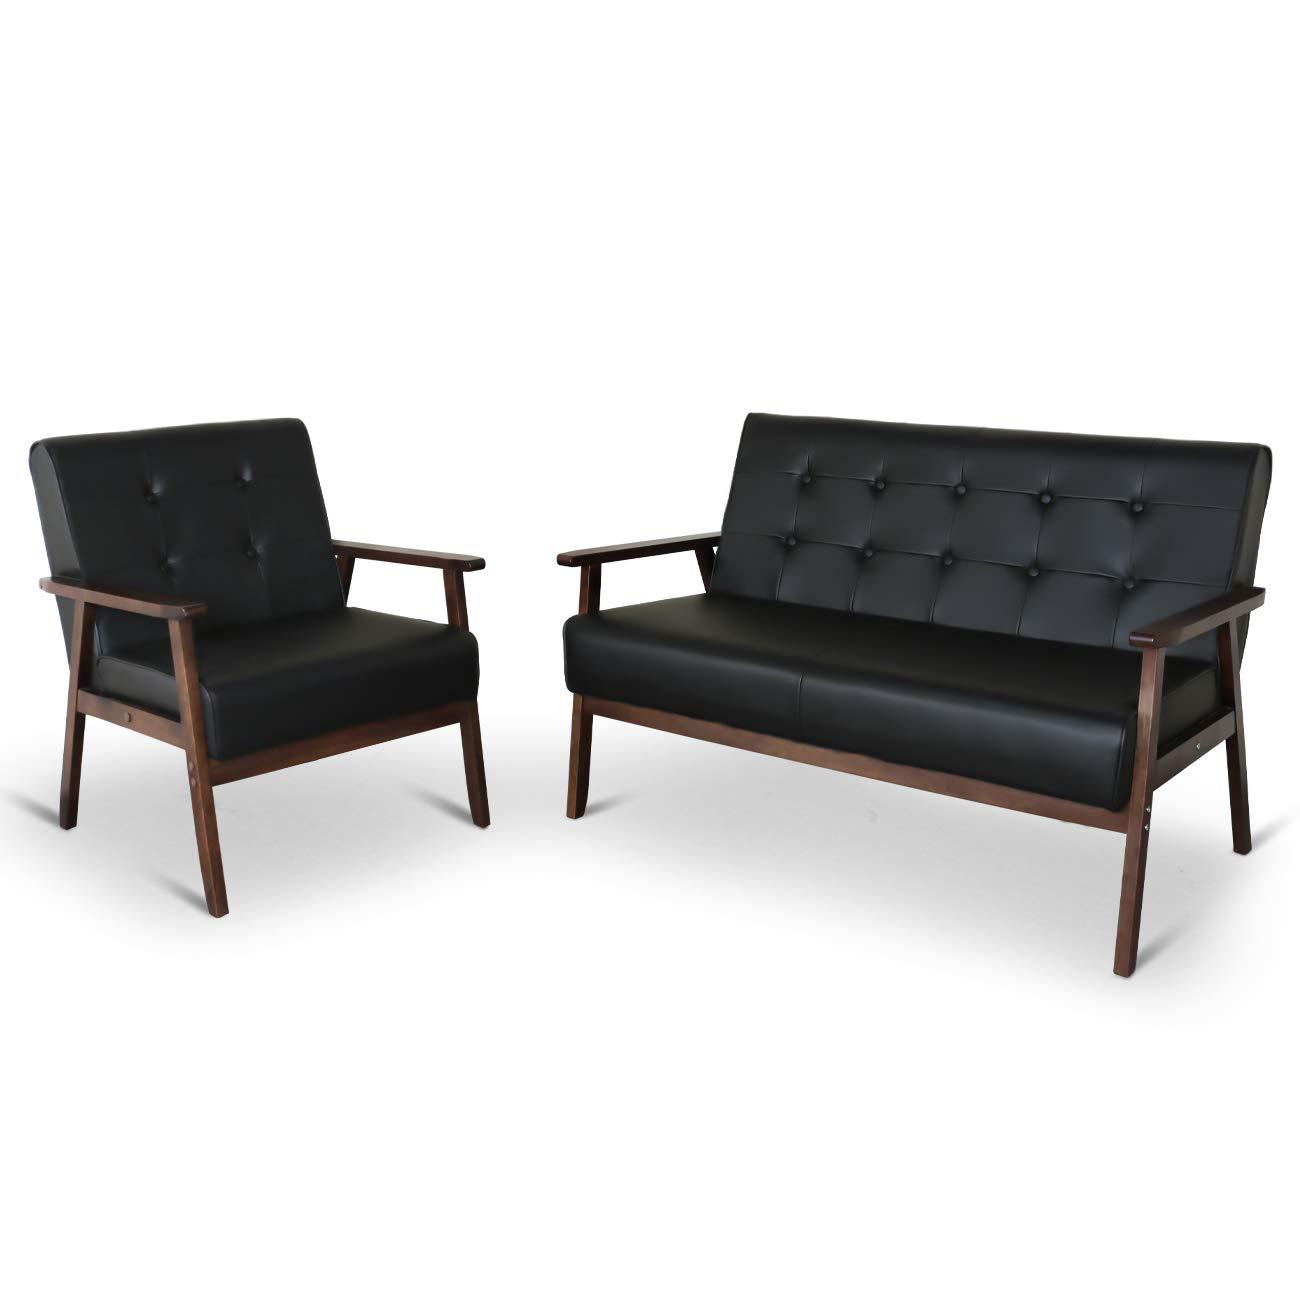 Mid Century Retro Modern Accent Chair Wooden Arm